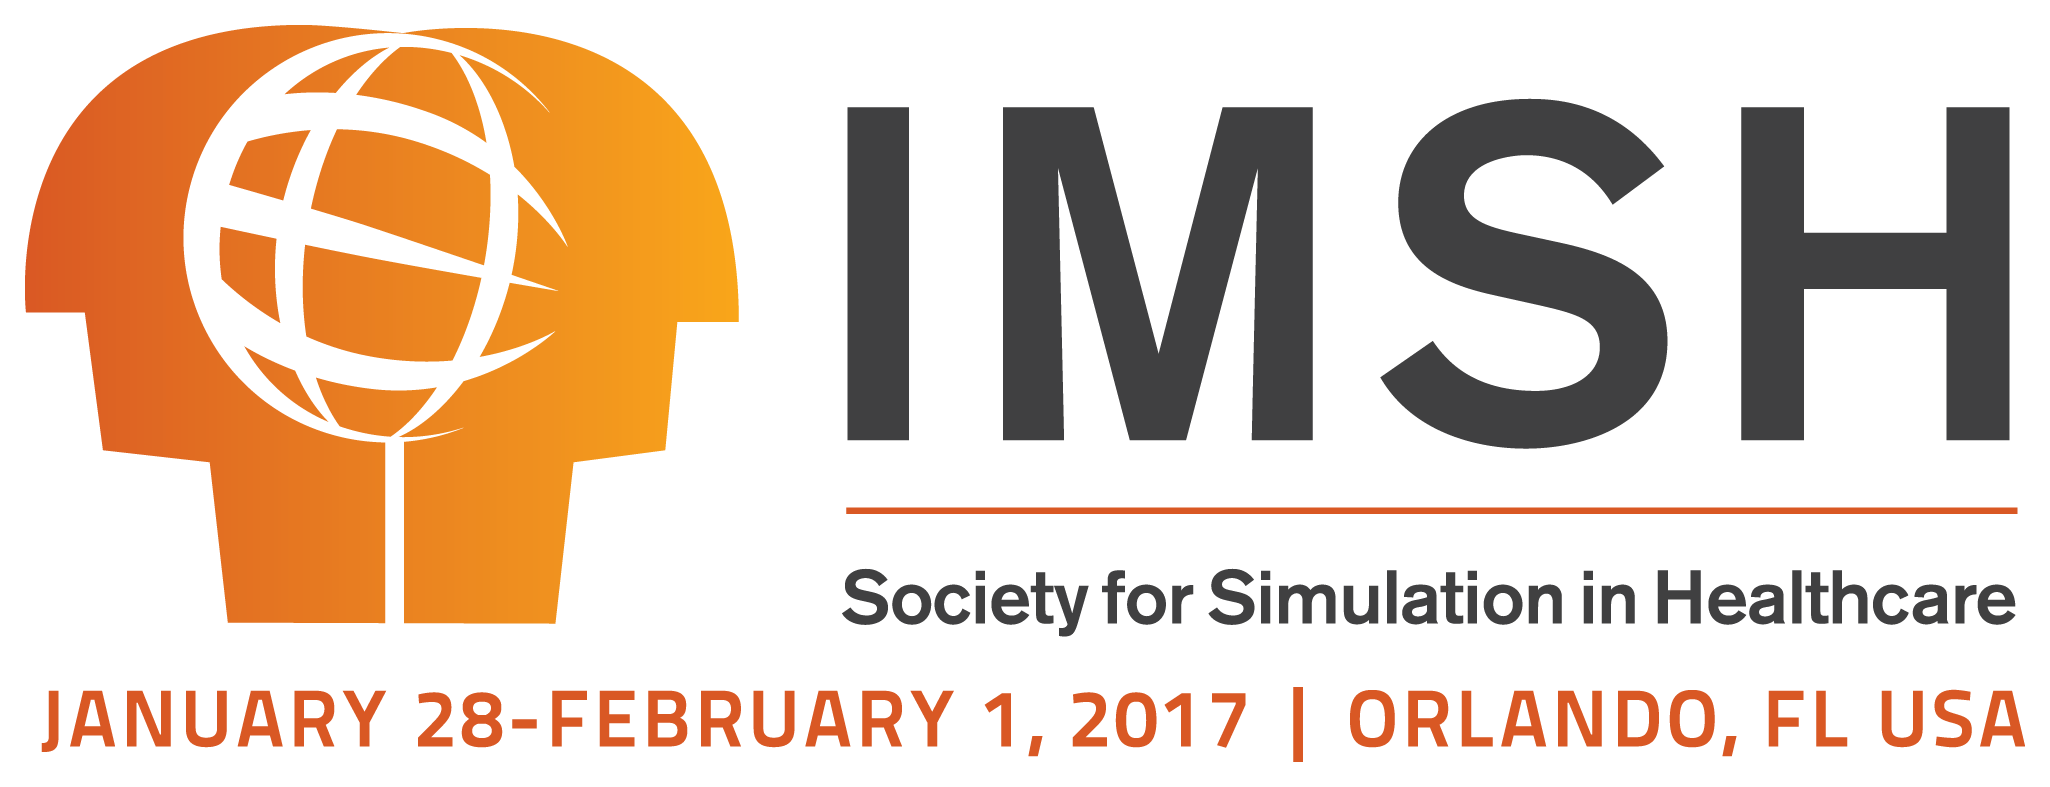 IMSH_CMYK-event